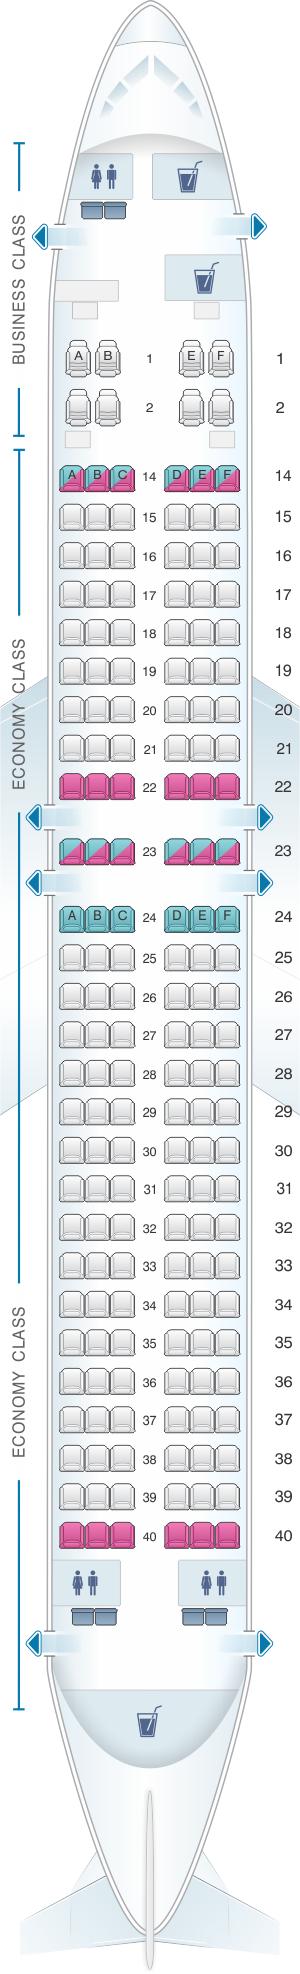 Seat map for Fiji Airways Boeing B737 800 170pax